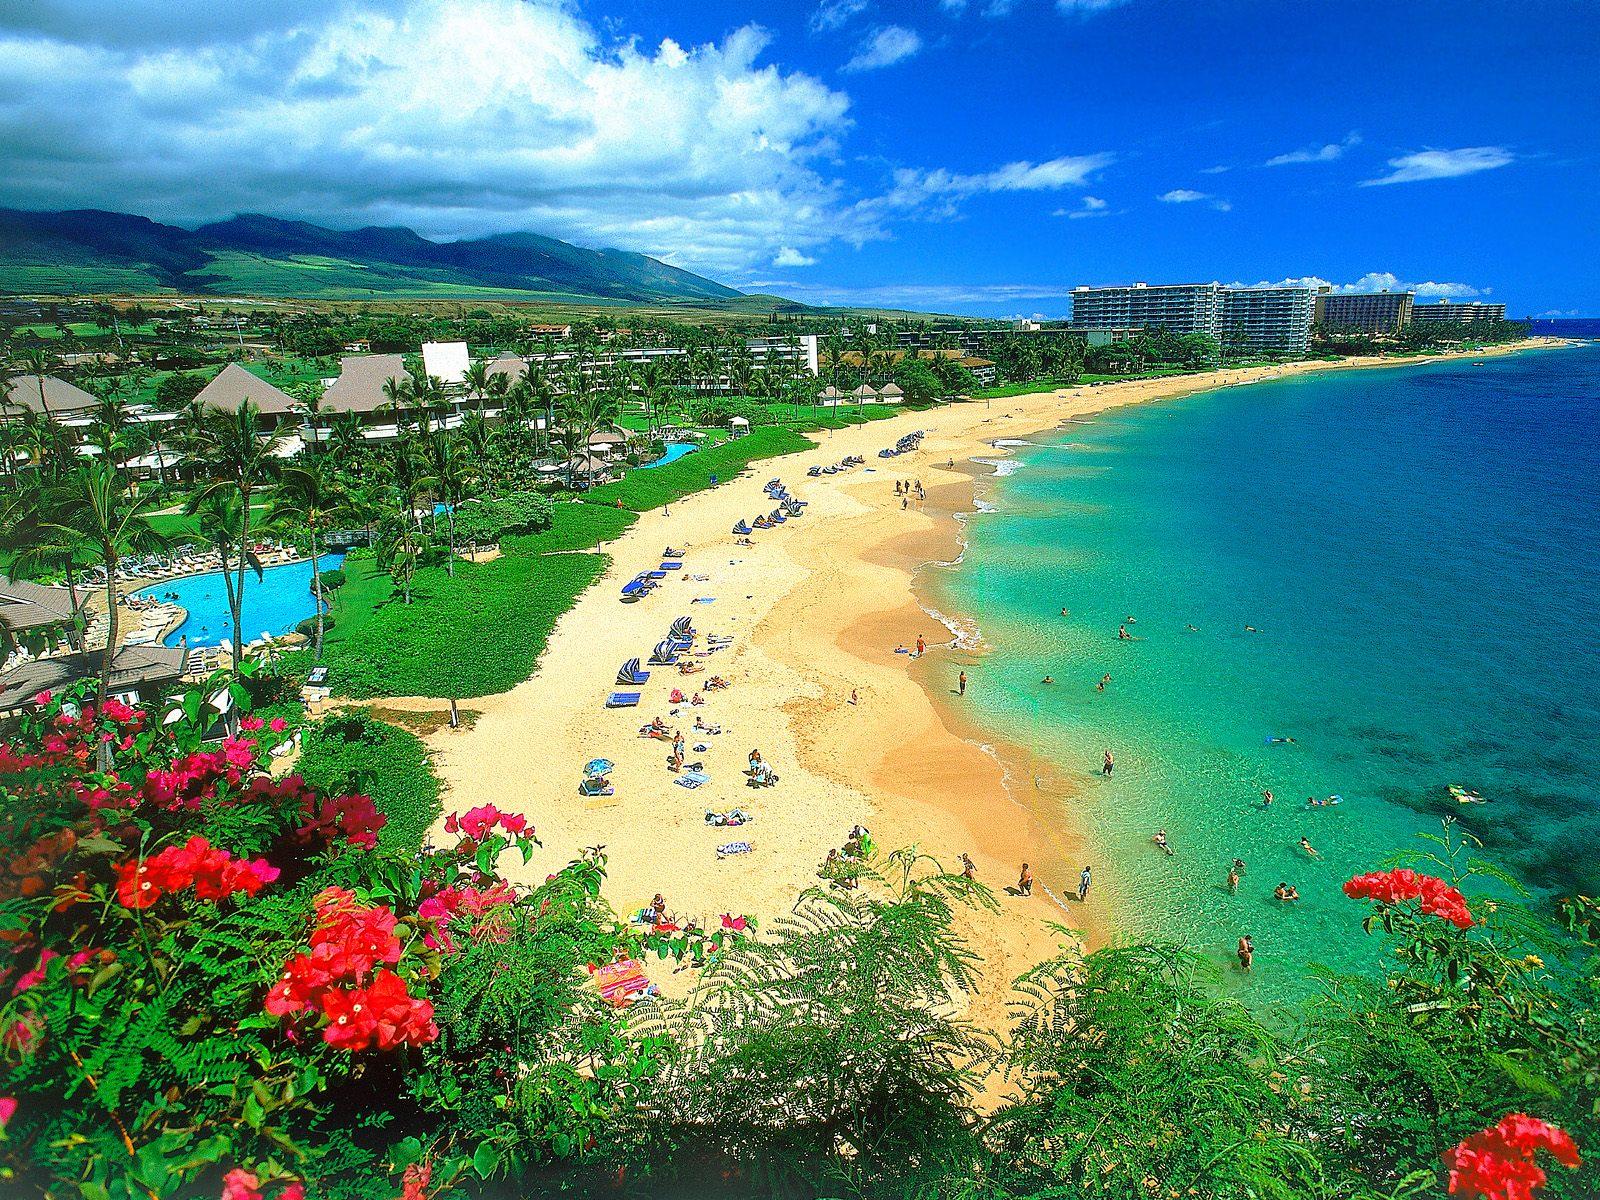 beach resort disasters an economic hazard